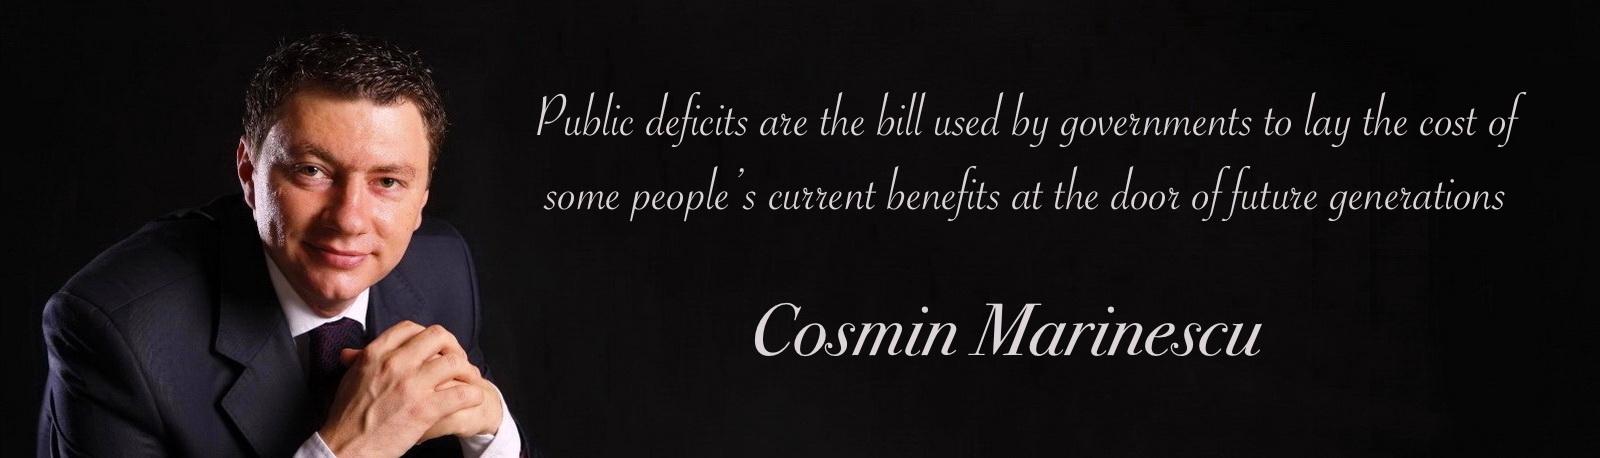 http://en.cosmin-marinescu.ro/wp-content/uploads/2017/10/Slide-4-EN.jpeg